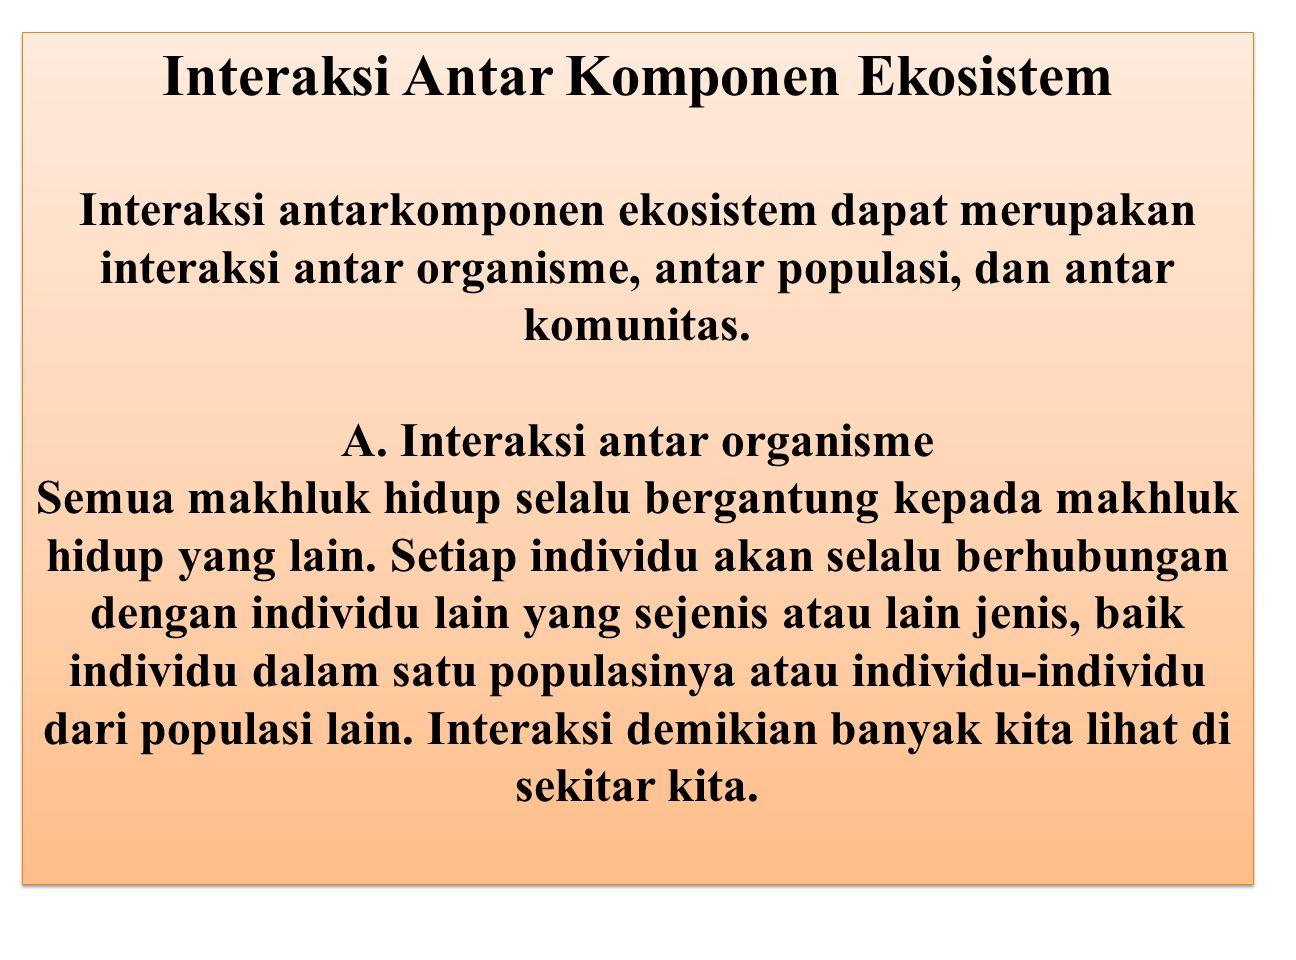 Interaksi Antar Komponen Ekosistem